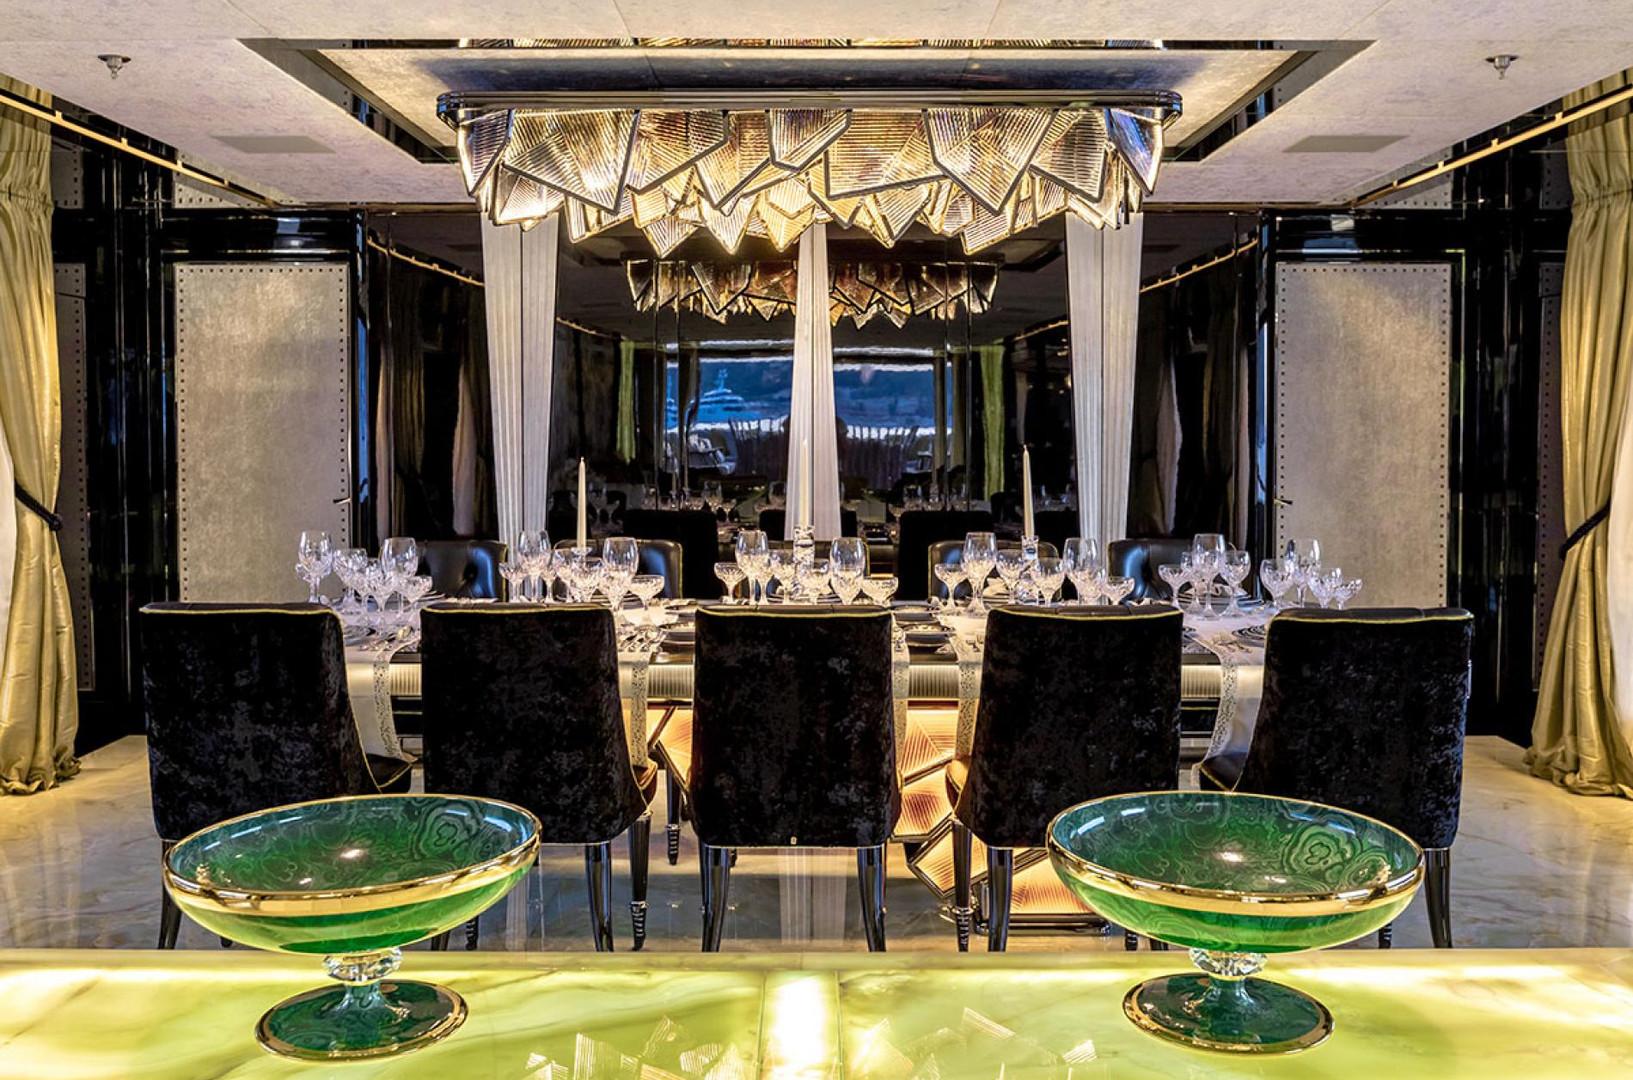 Yacht SARASTAR - formal dining